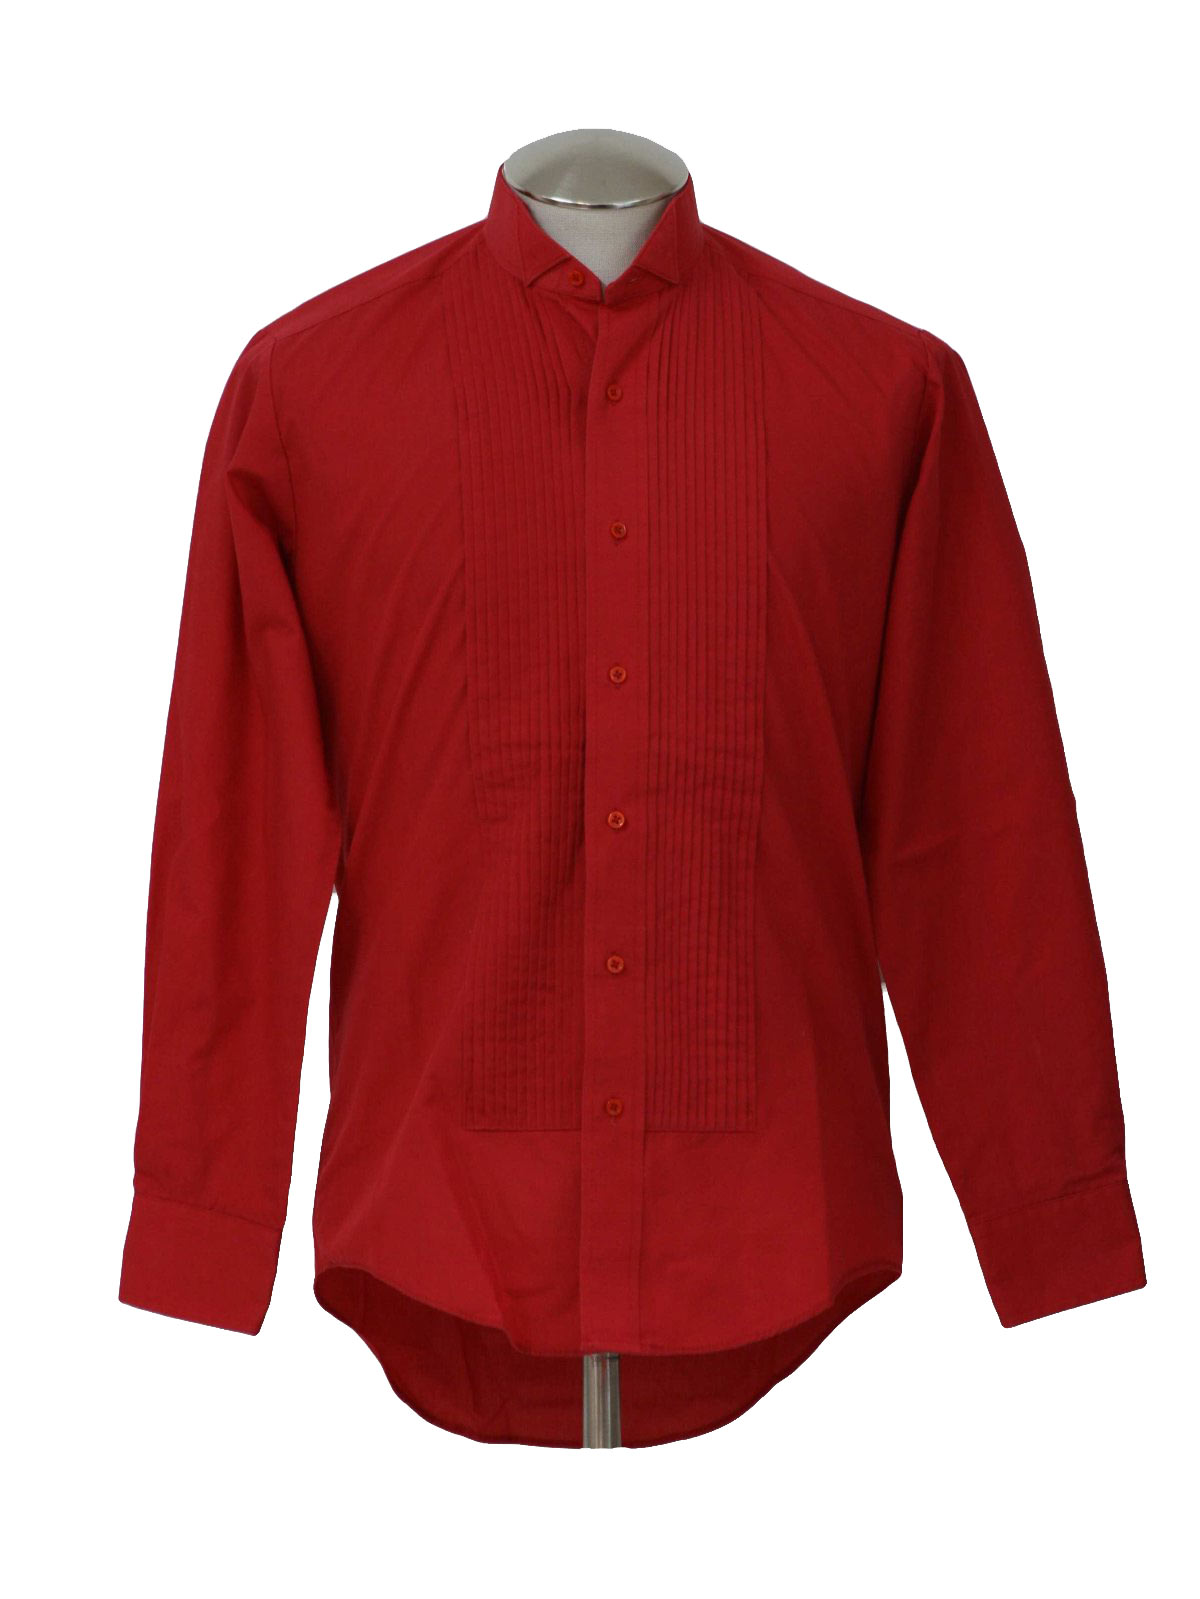 retro eighties shirt 80s classix mens red polyester